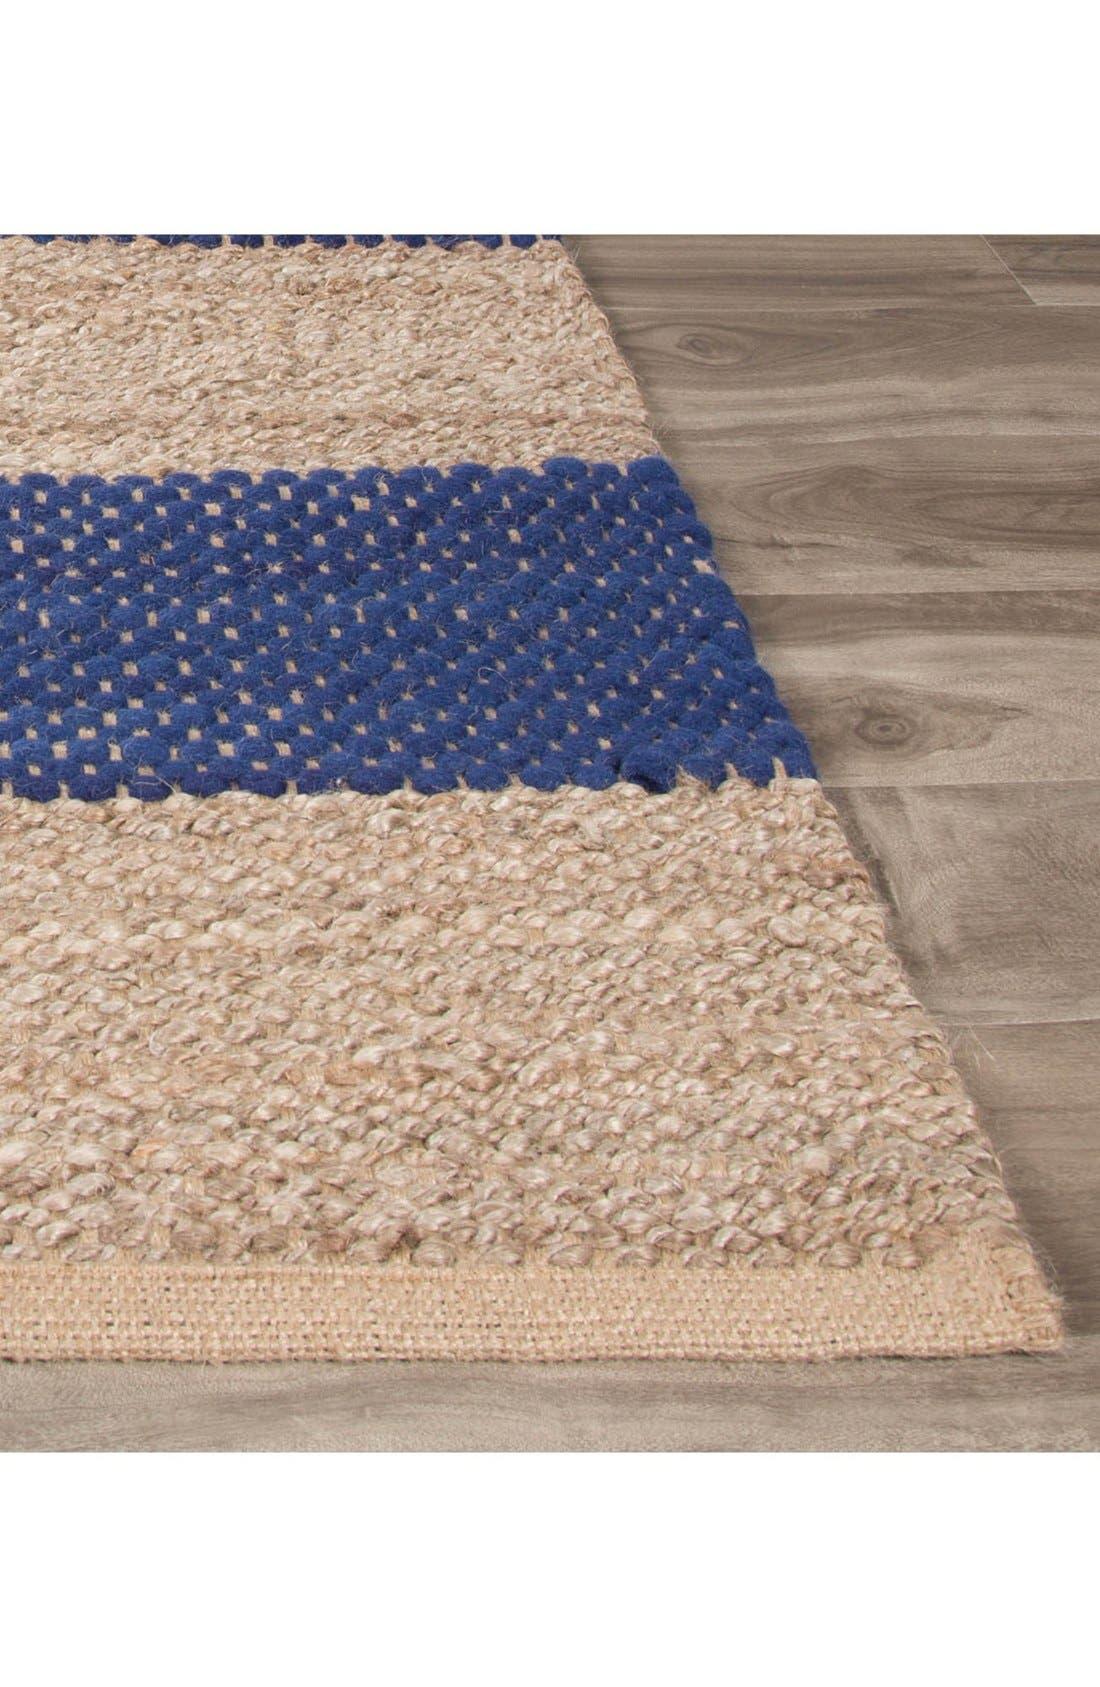 'nolita stripes' rug,                             Alternate thumbnail 2, color,                             Blue/ Natural